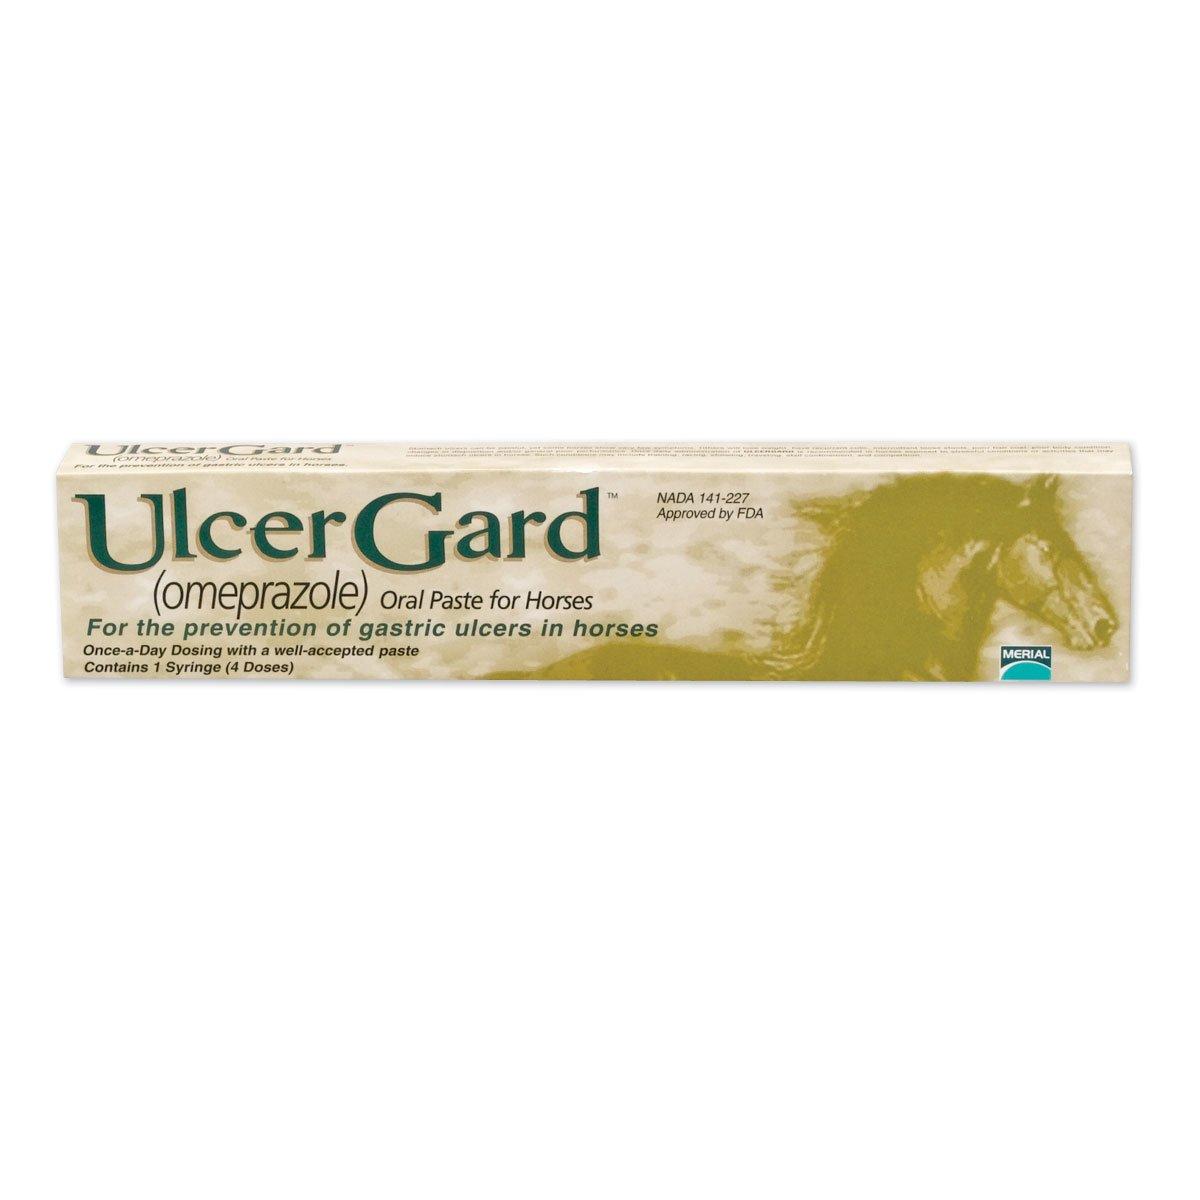 Merial UlcerGard (Omeprazole 2.28gm) Oral Paste by Merial (Image #1)